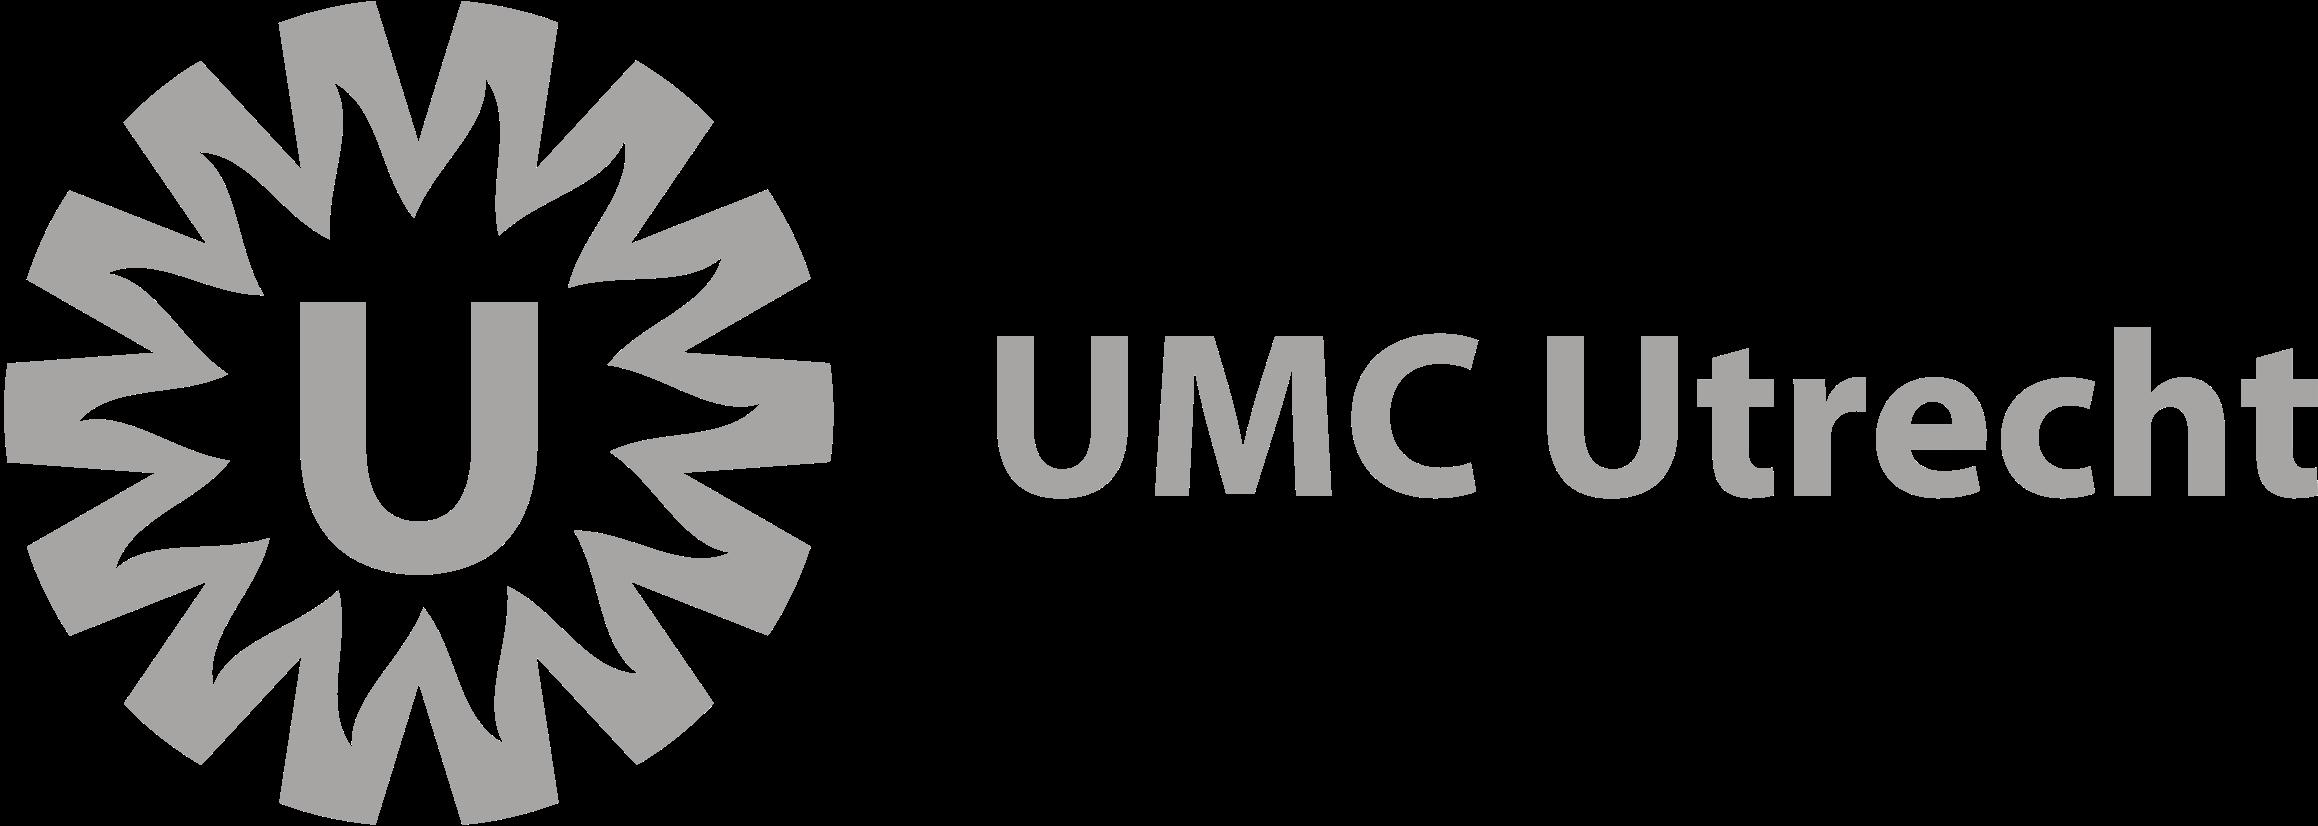 grey-umc-utrecht-1.png